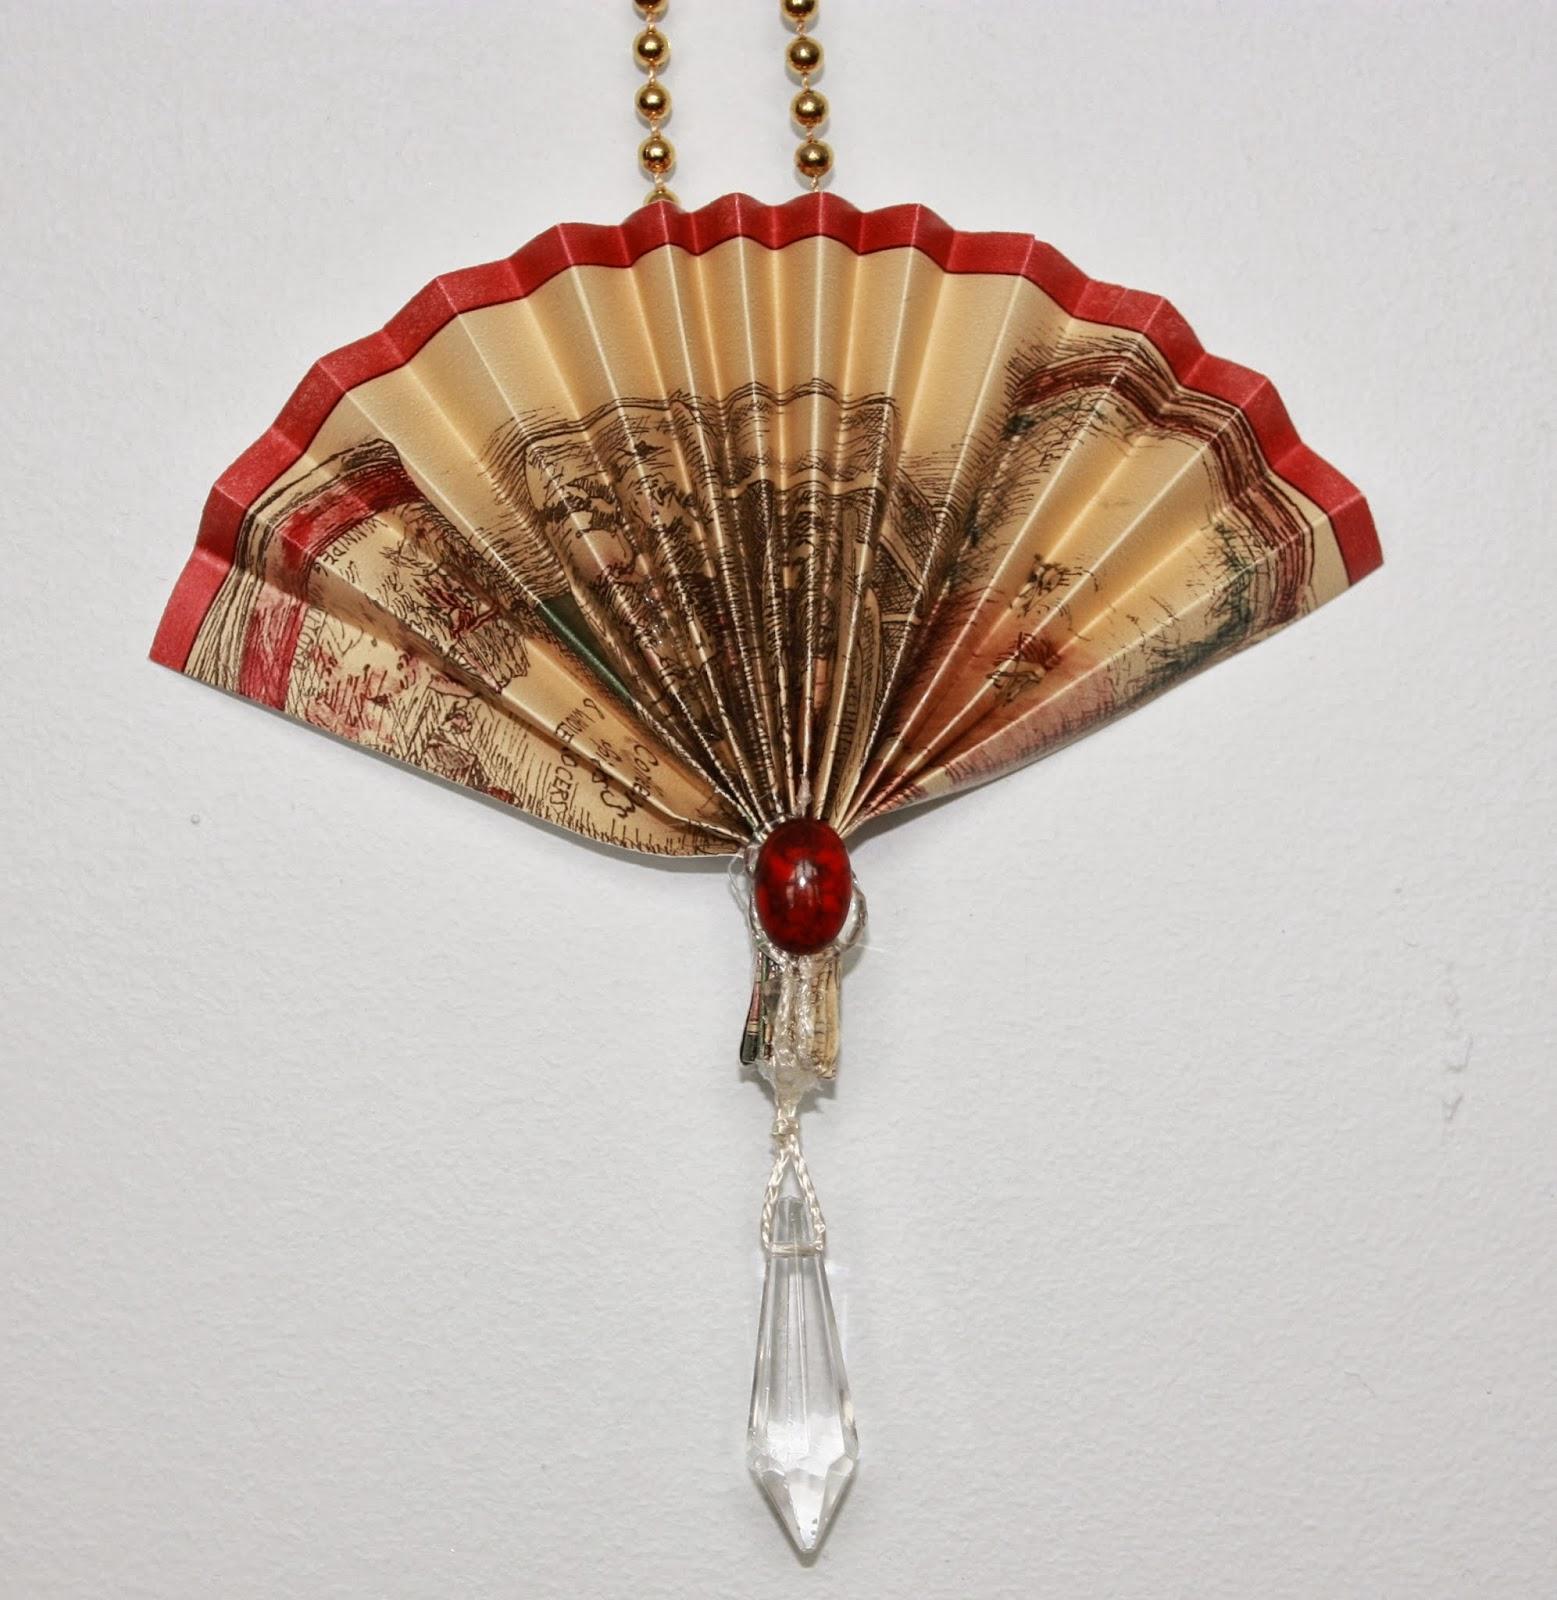 Victorian Christmas Decorations: Artsybuildinglady: Victorian Fan Christmas Ornaments